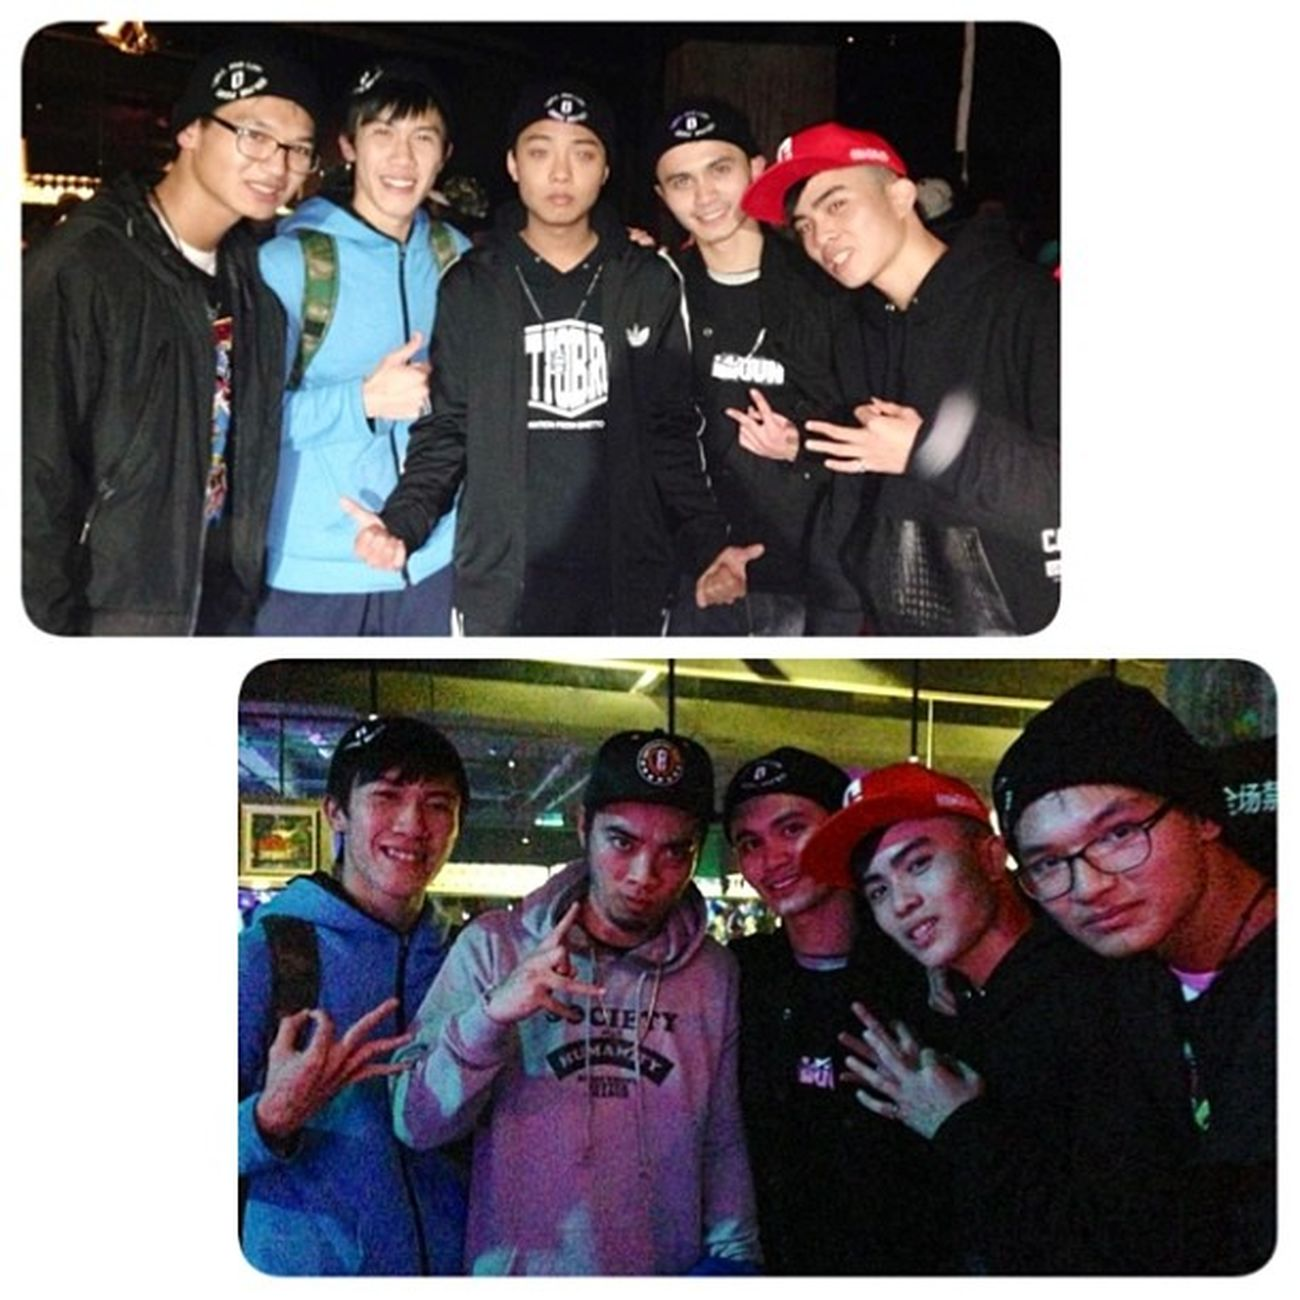 广东队2013 HipHop Chillgun 讲者 广东队